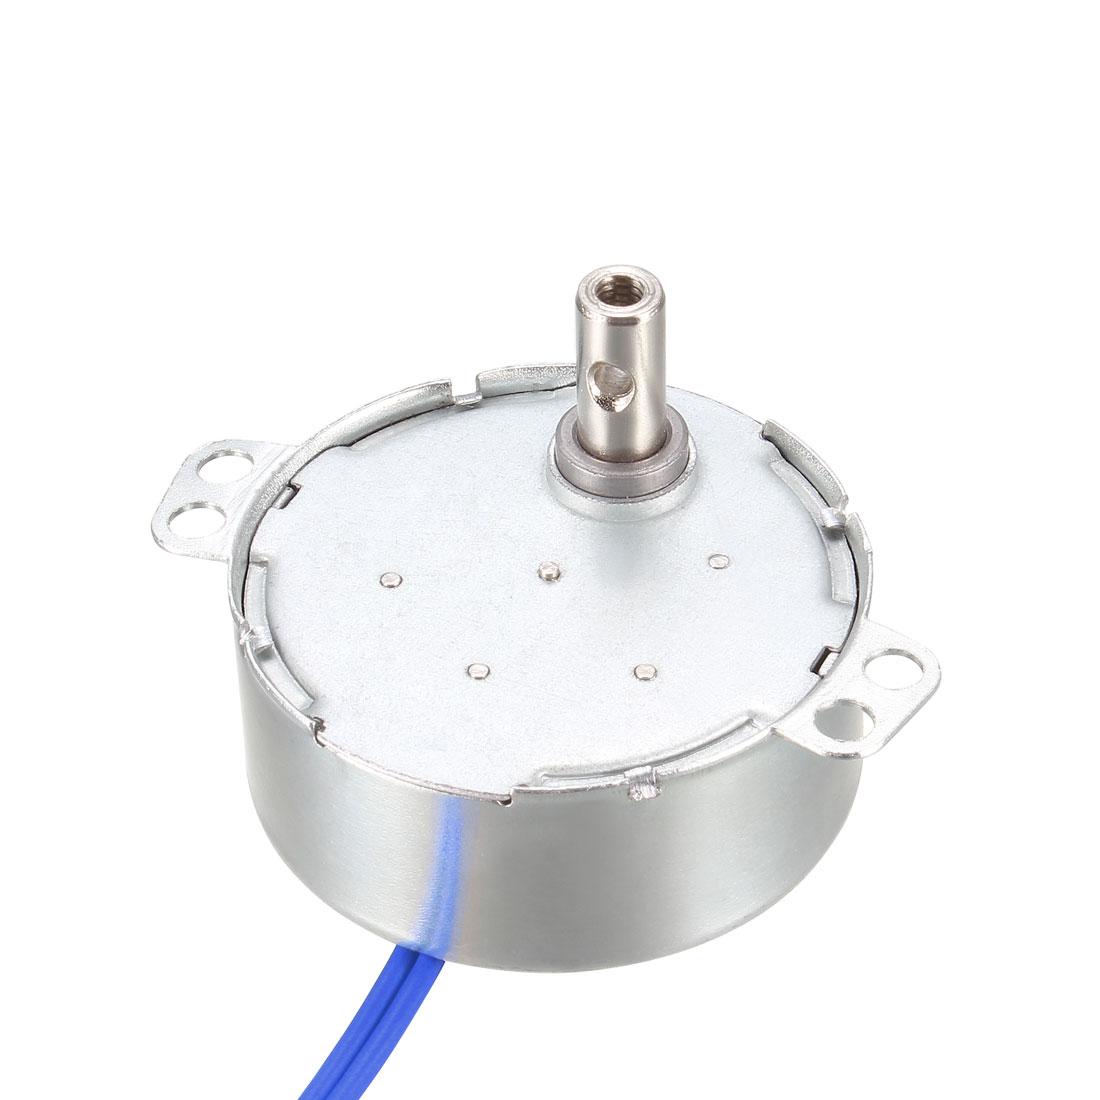 Electric Synchronous Synchron Motor Motor 100-127 VAC 50-60Hz CCW/CW 4W 2-2.4RPM